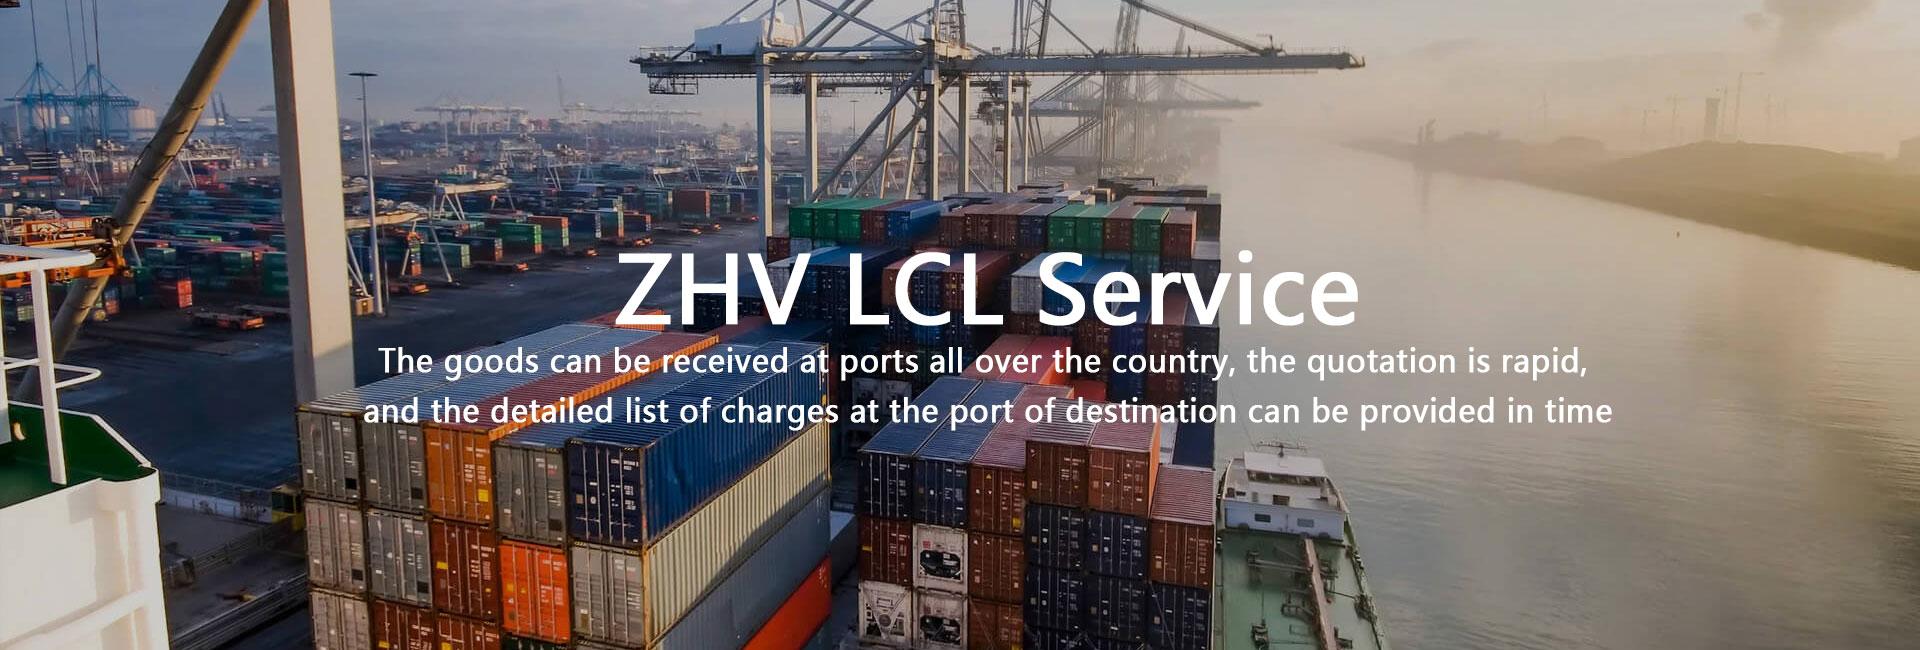 zhv International Logistics